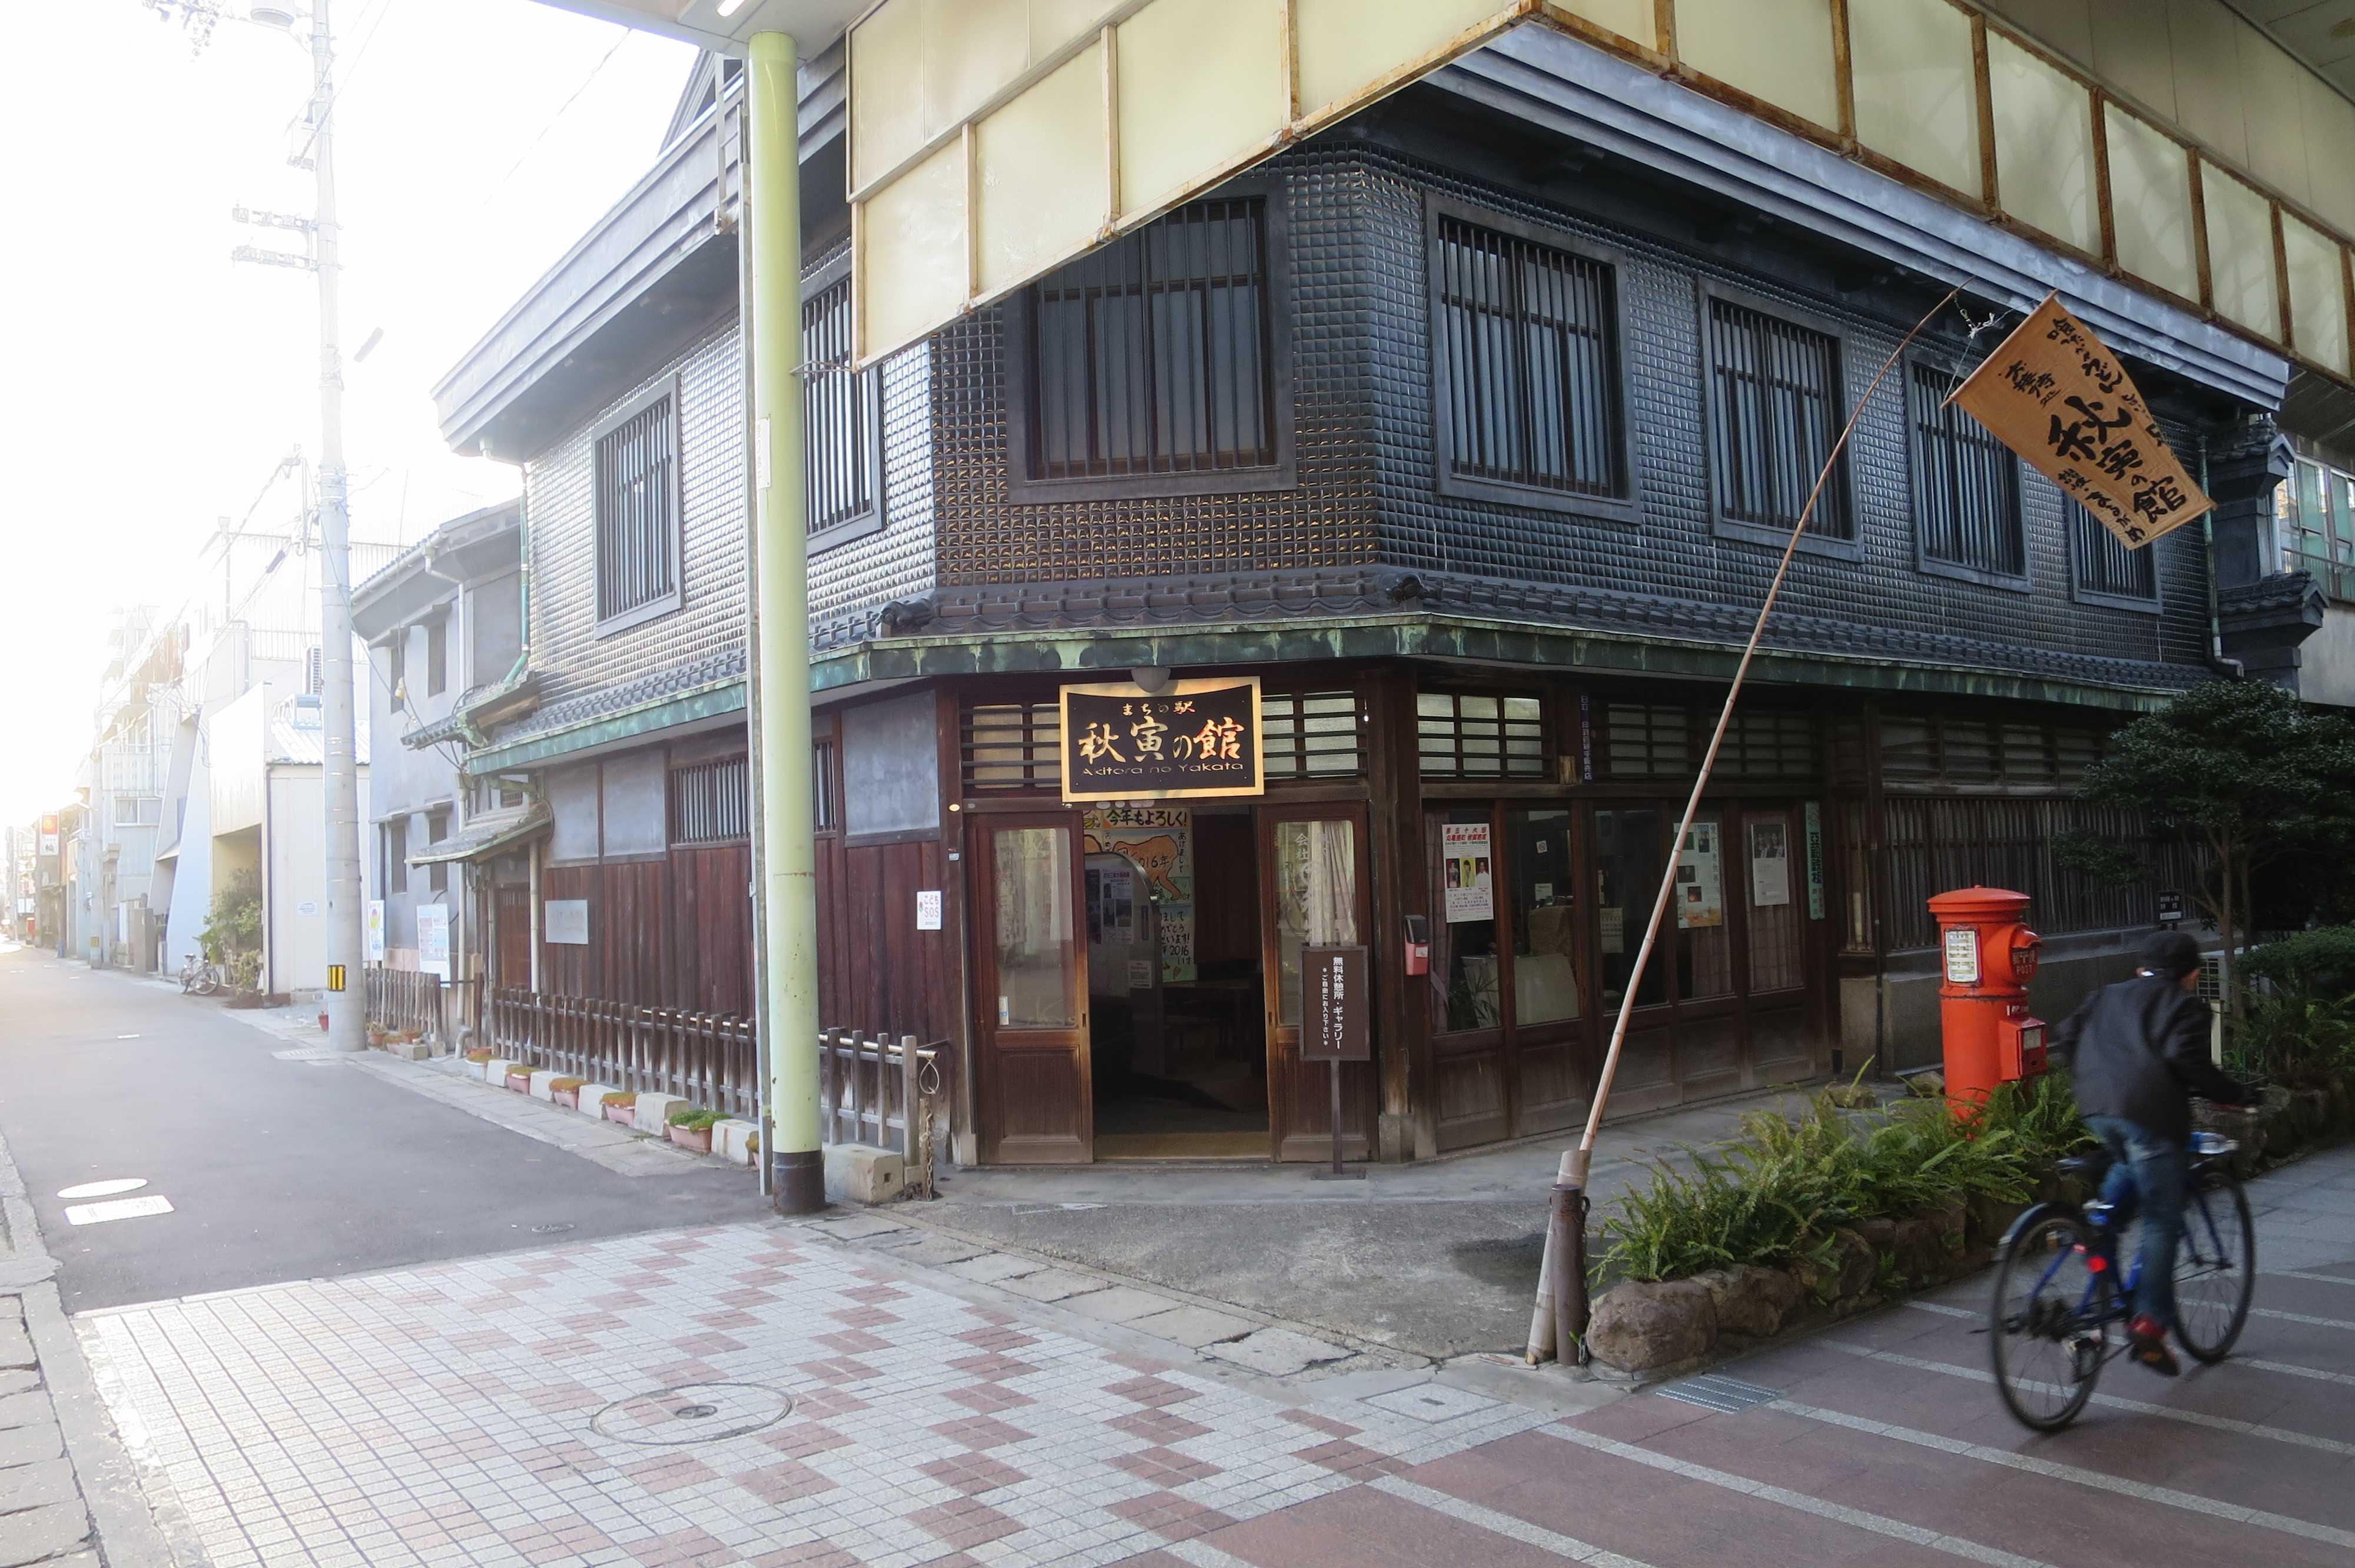 丸亀 - 秋寅の館